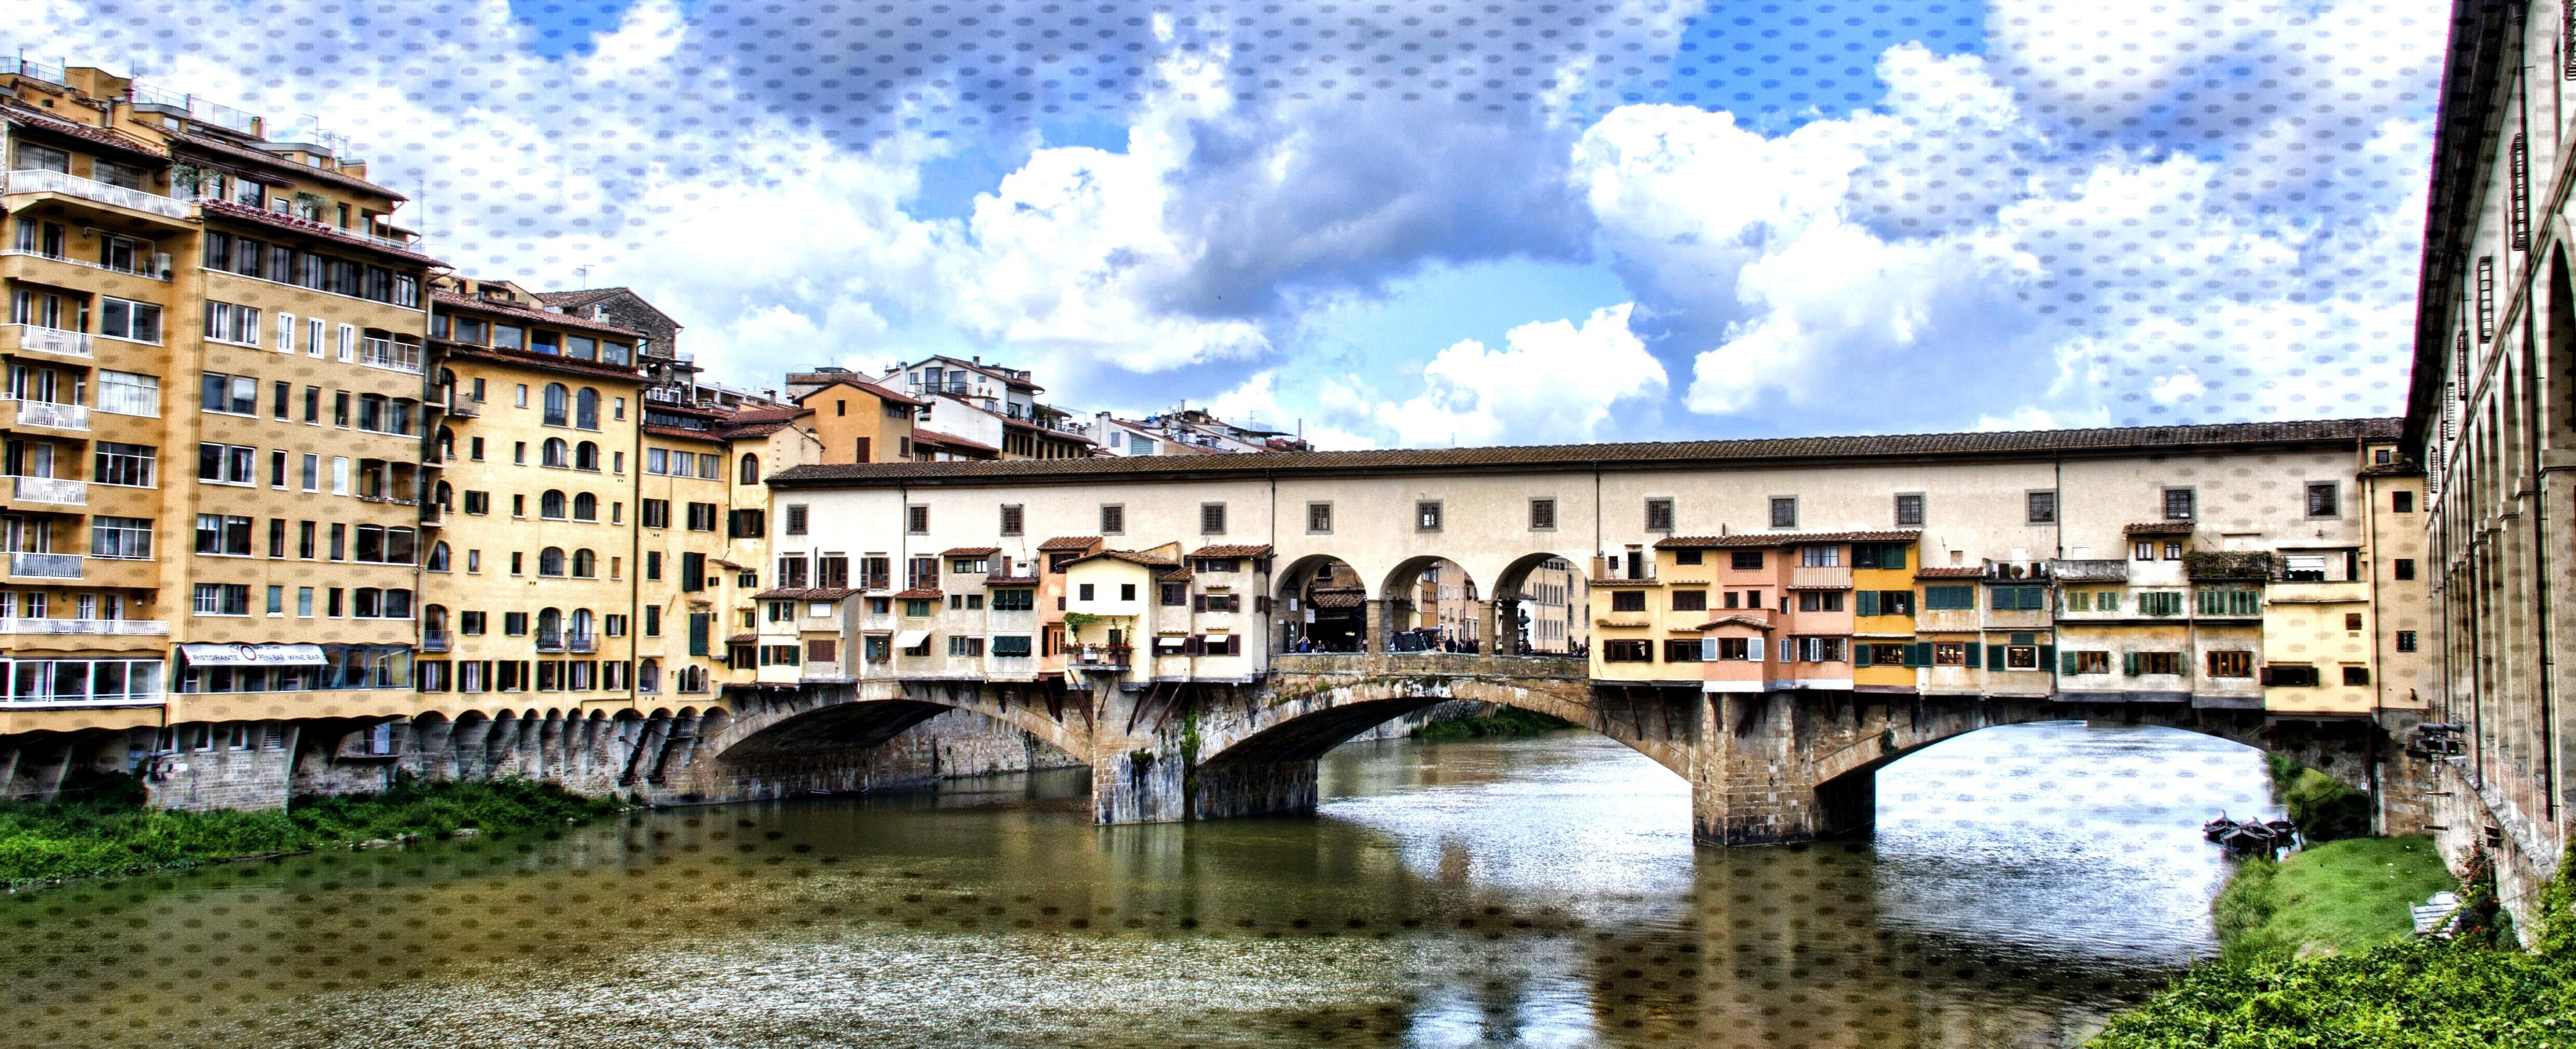 gray concrete bridge near yellow buildings during daytime   european History Wallpaper